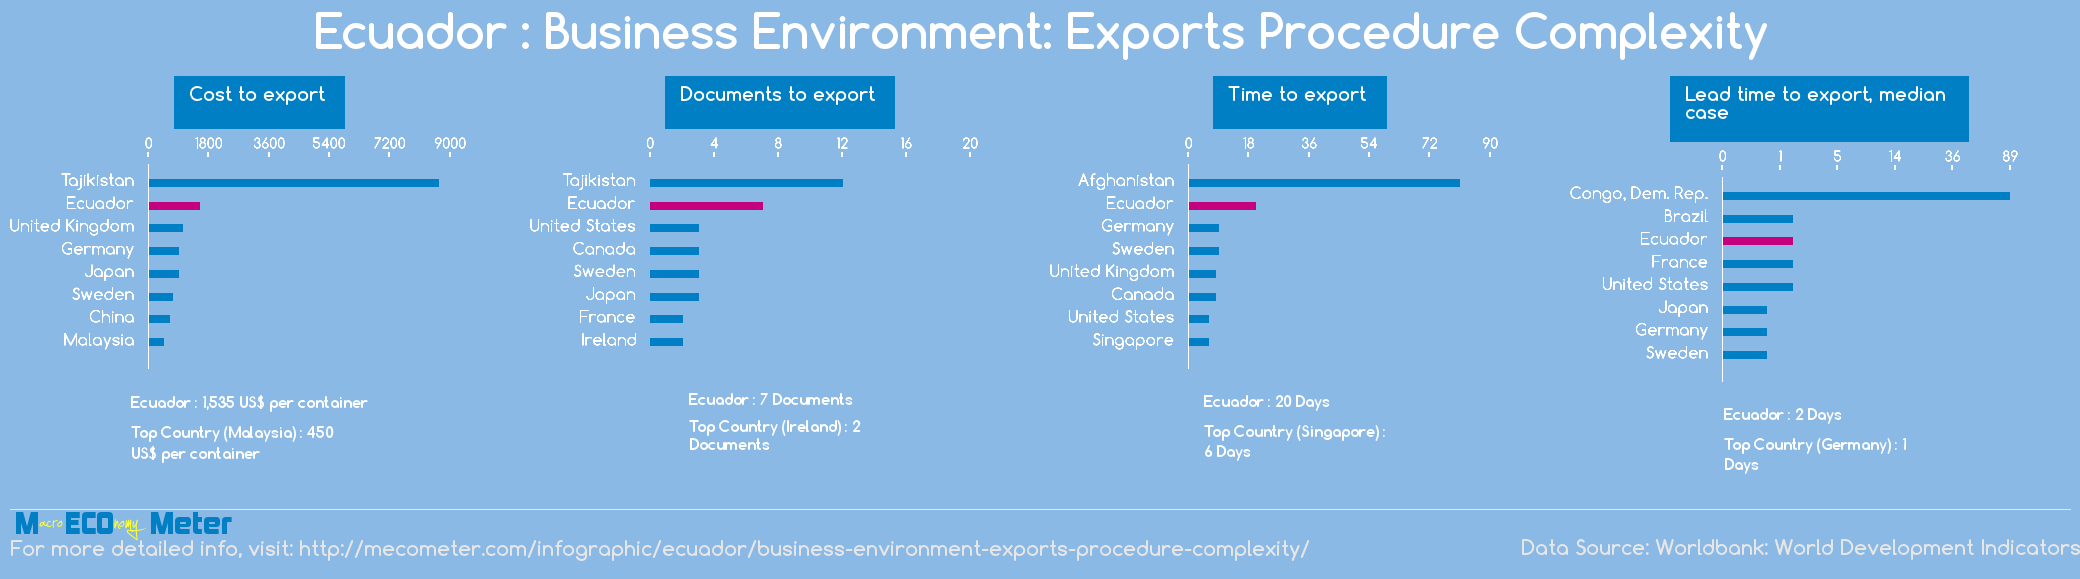 Ecuador : Business Environment: Exports Procedure Complexity